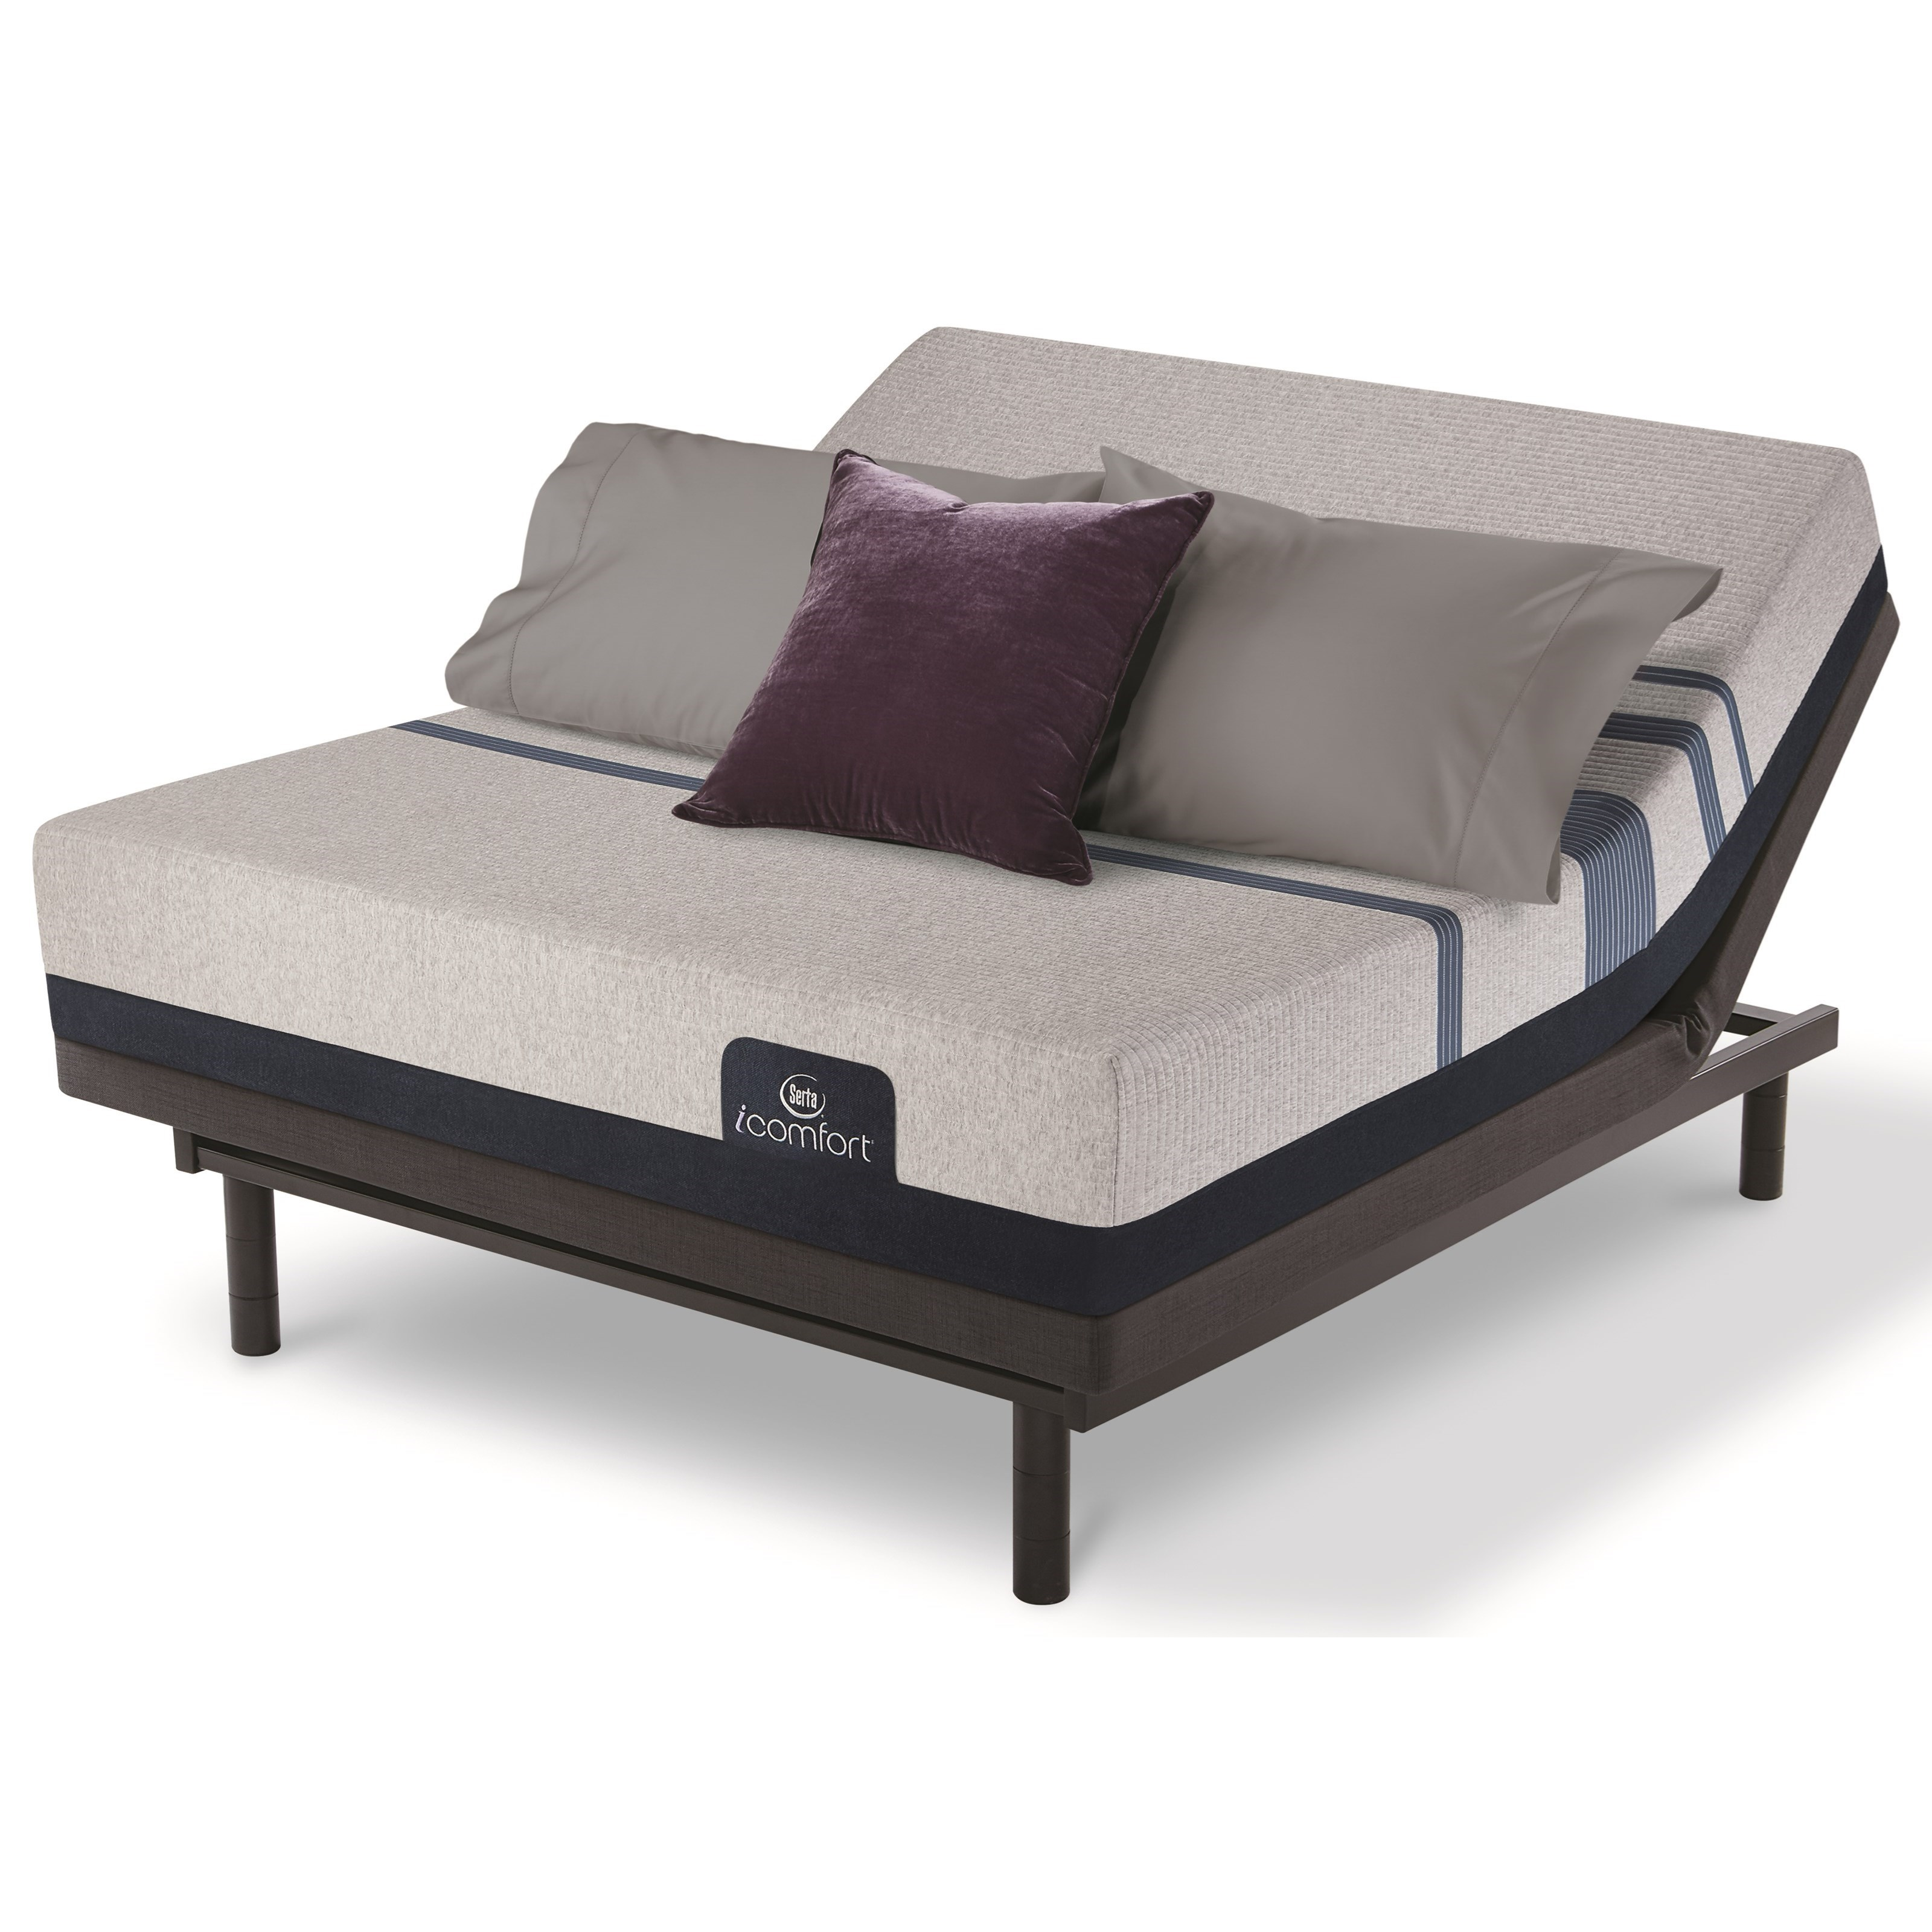 serta icomfort blue 300 firm 500801288 1020 500826619 7520 twin extra long firm gel memory foam. Black Bedroom Furniture Sets. Home Design Ideas